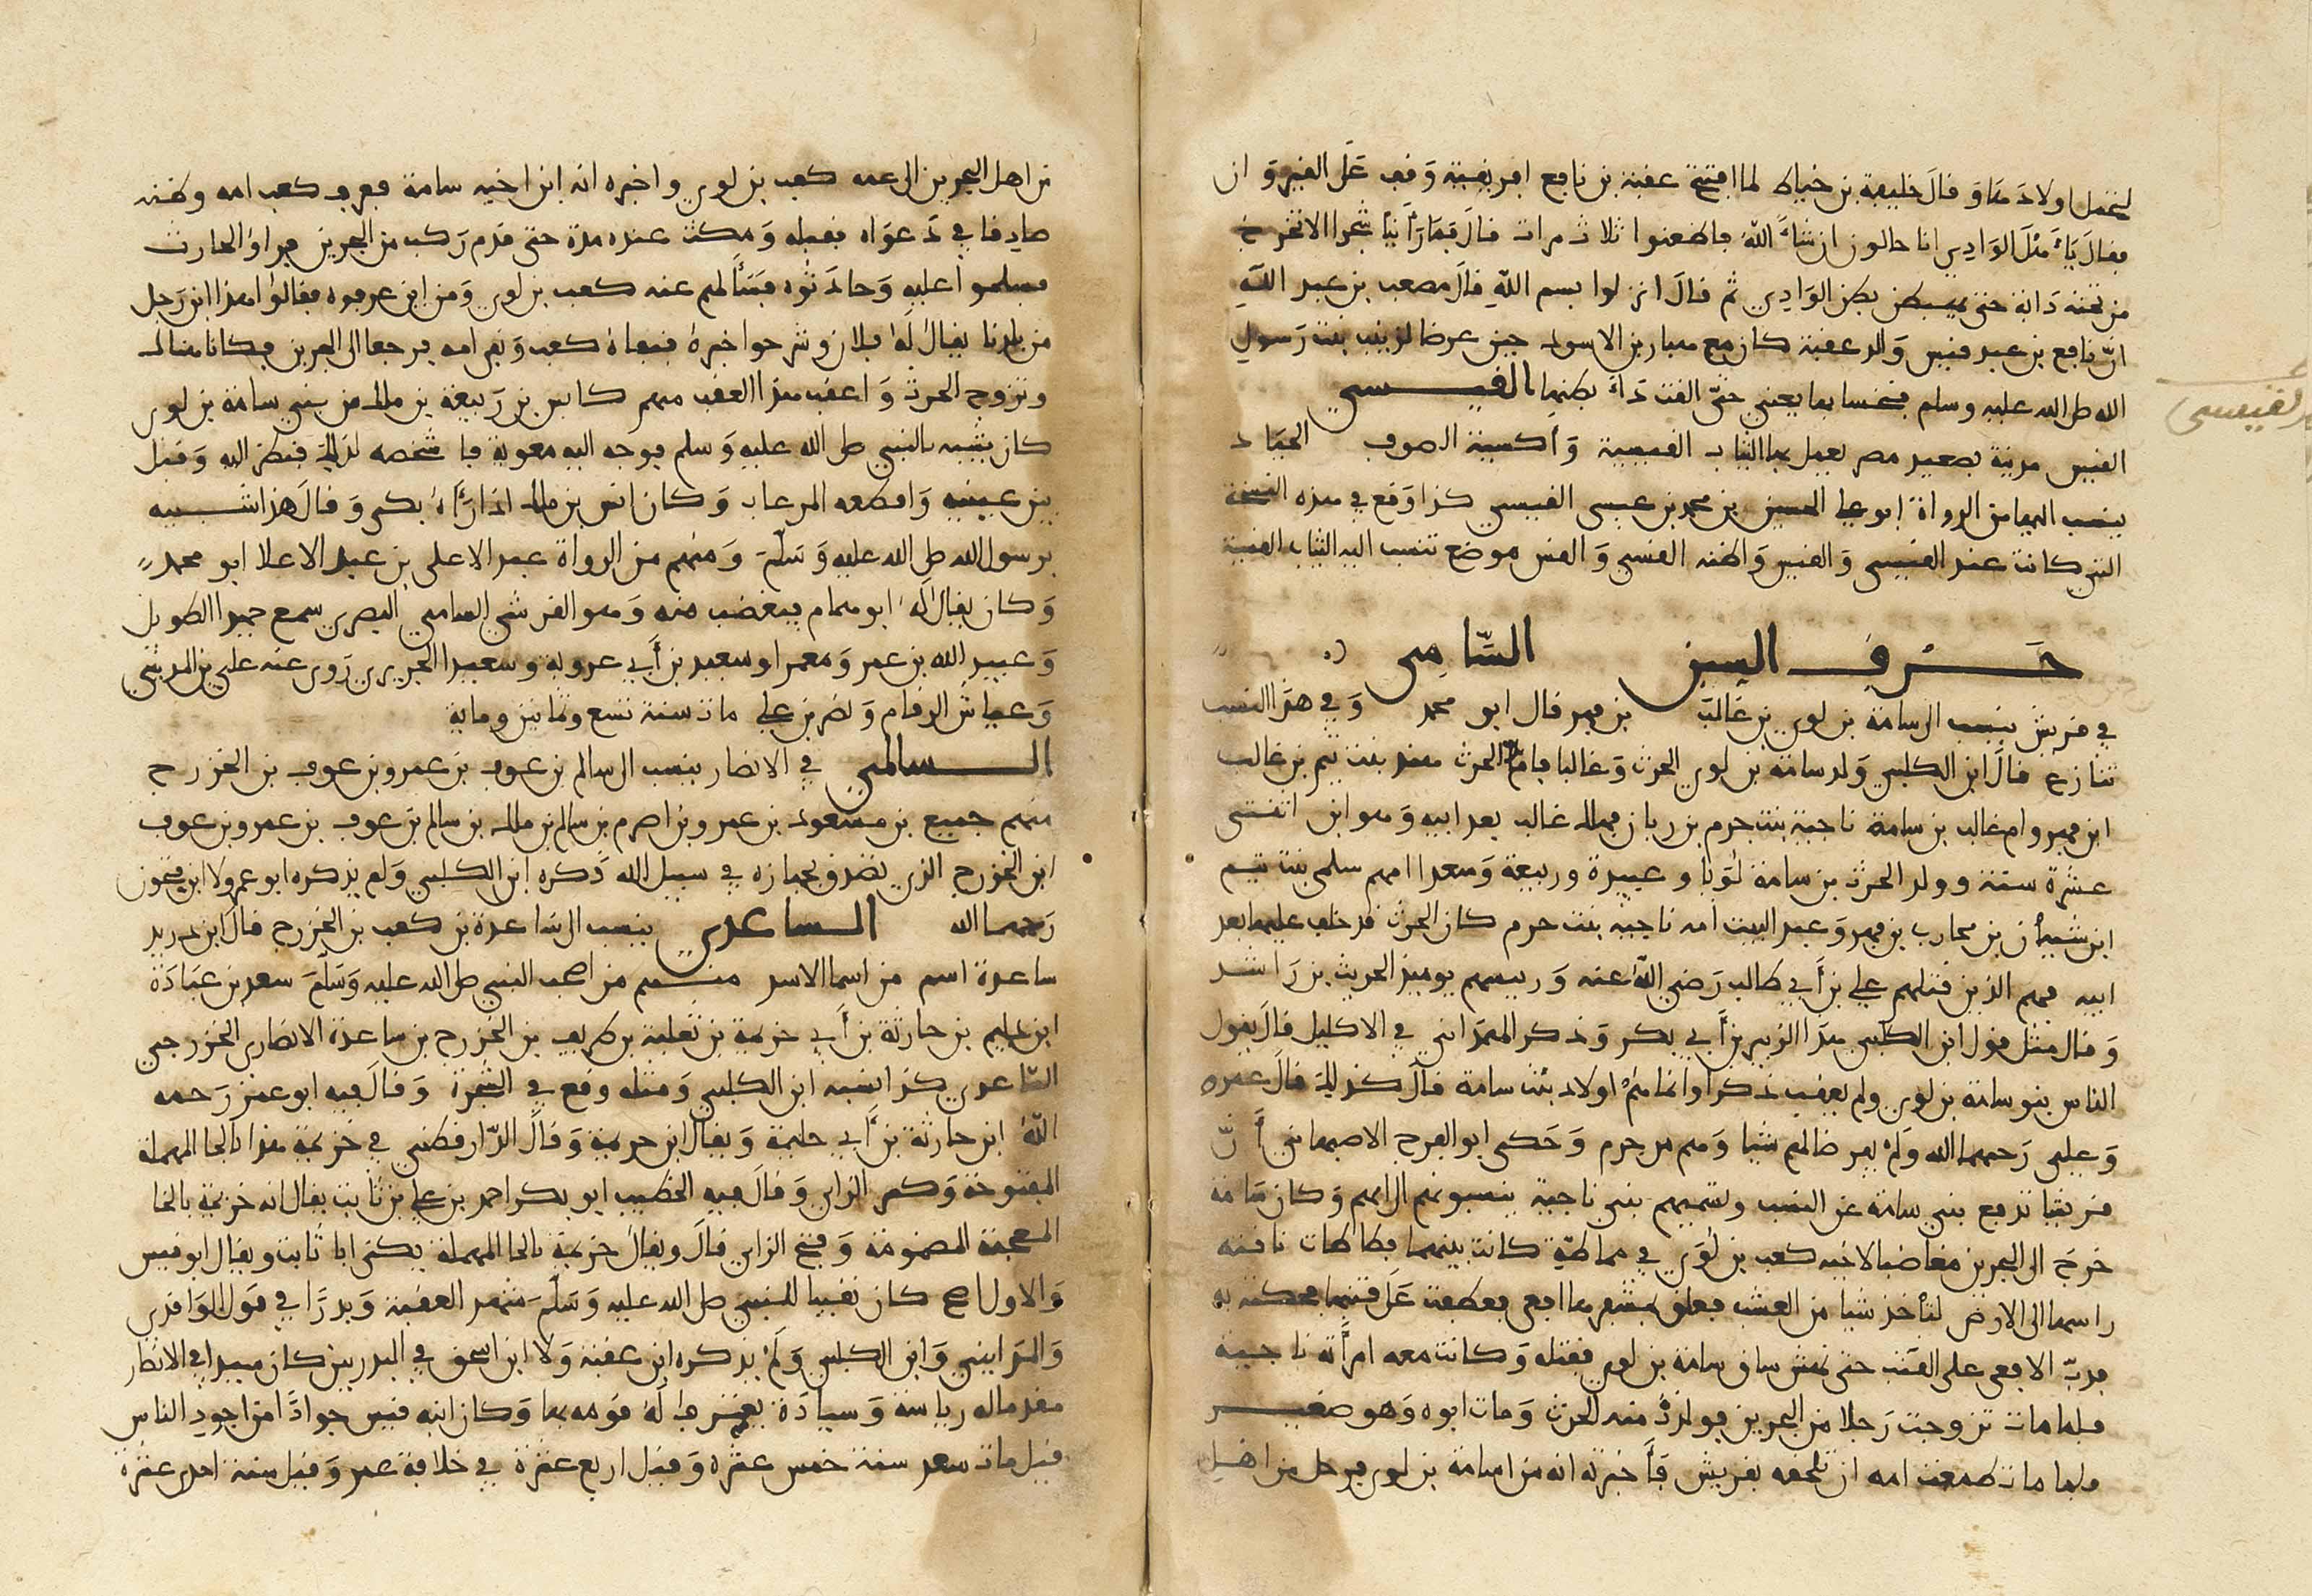 ABU MUHAMMAD 'ABDULLAH BIN 'AL